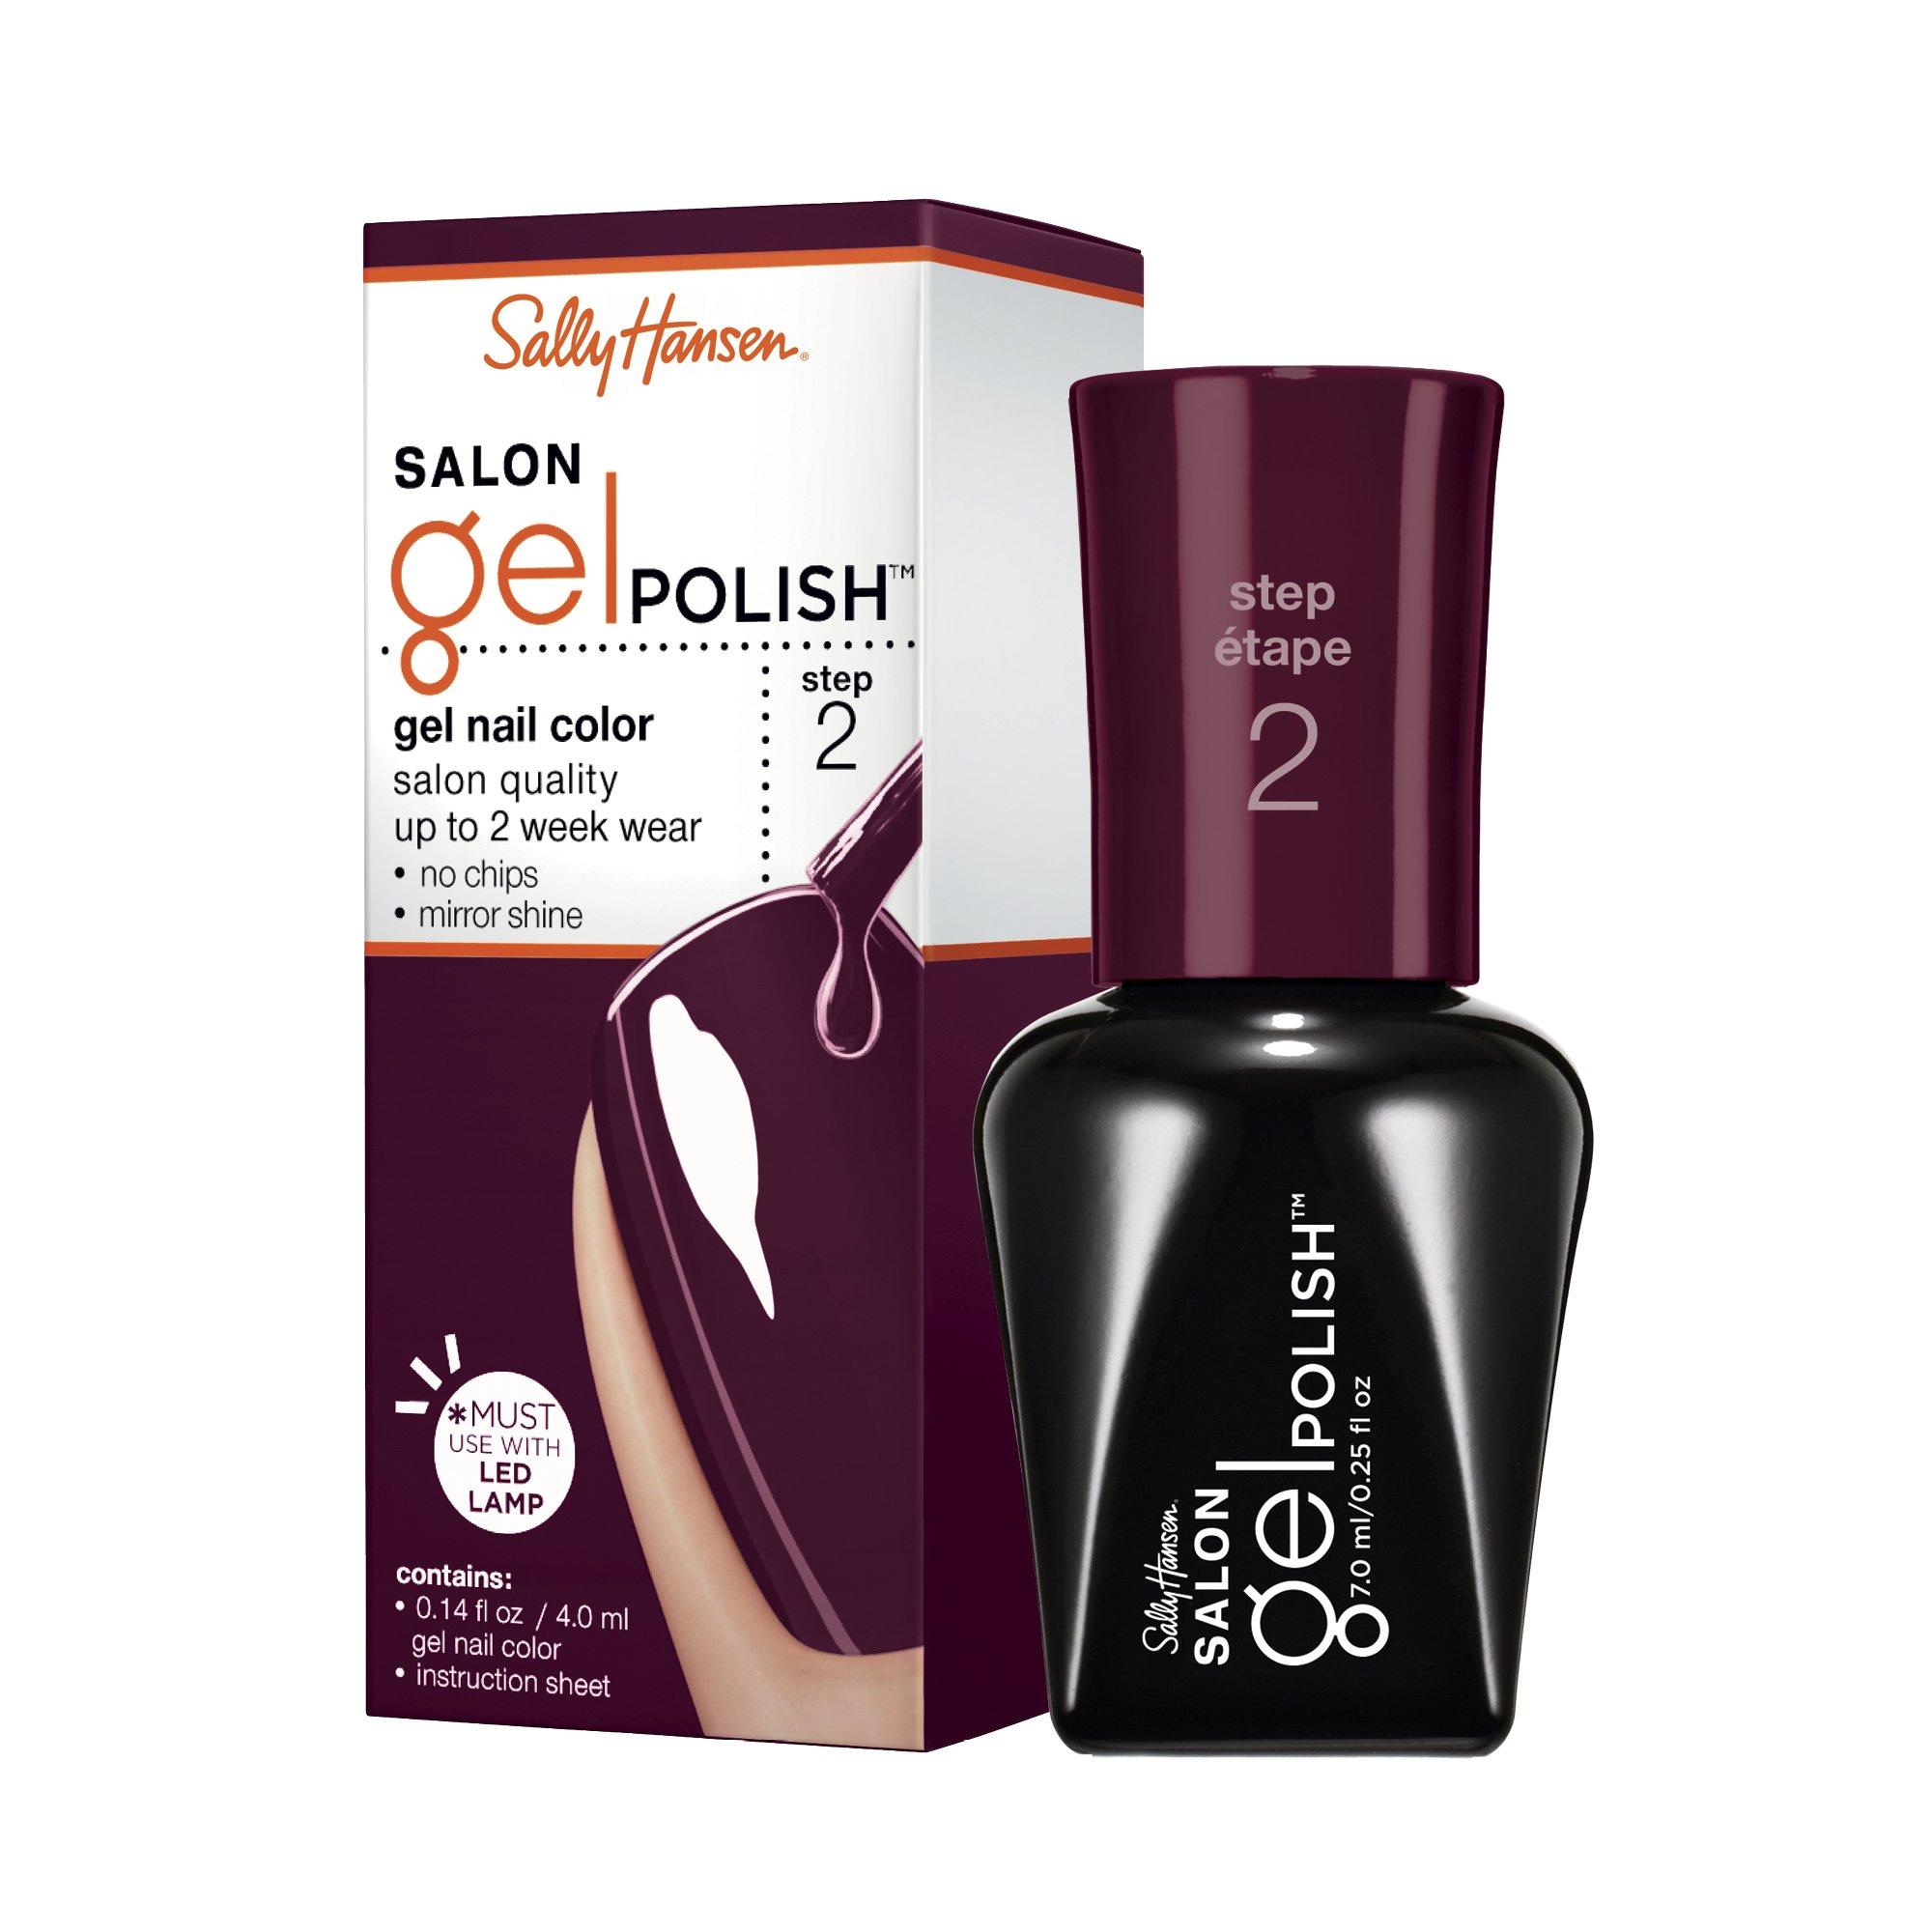 Sally Hansen Salon Pro Gel, Pat On The Black, 0.25 Fluid Ounce